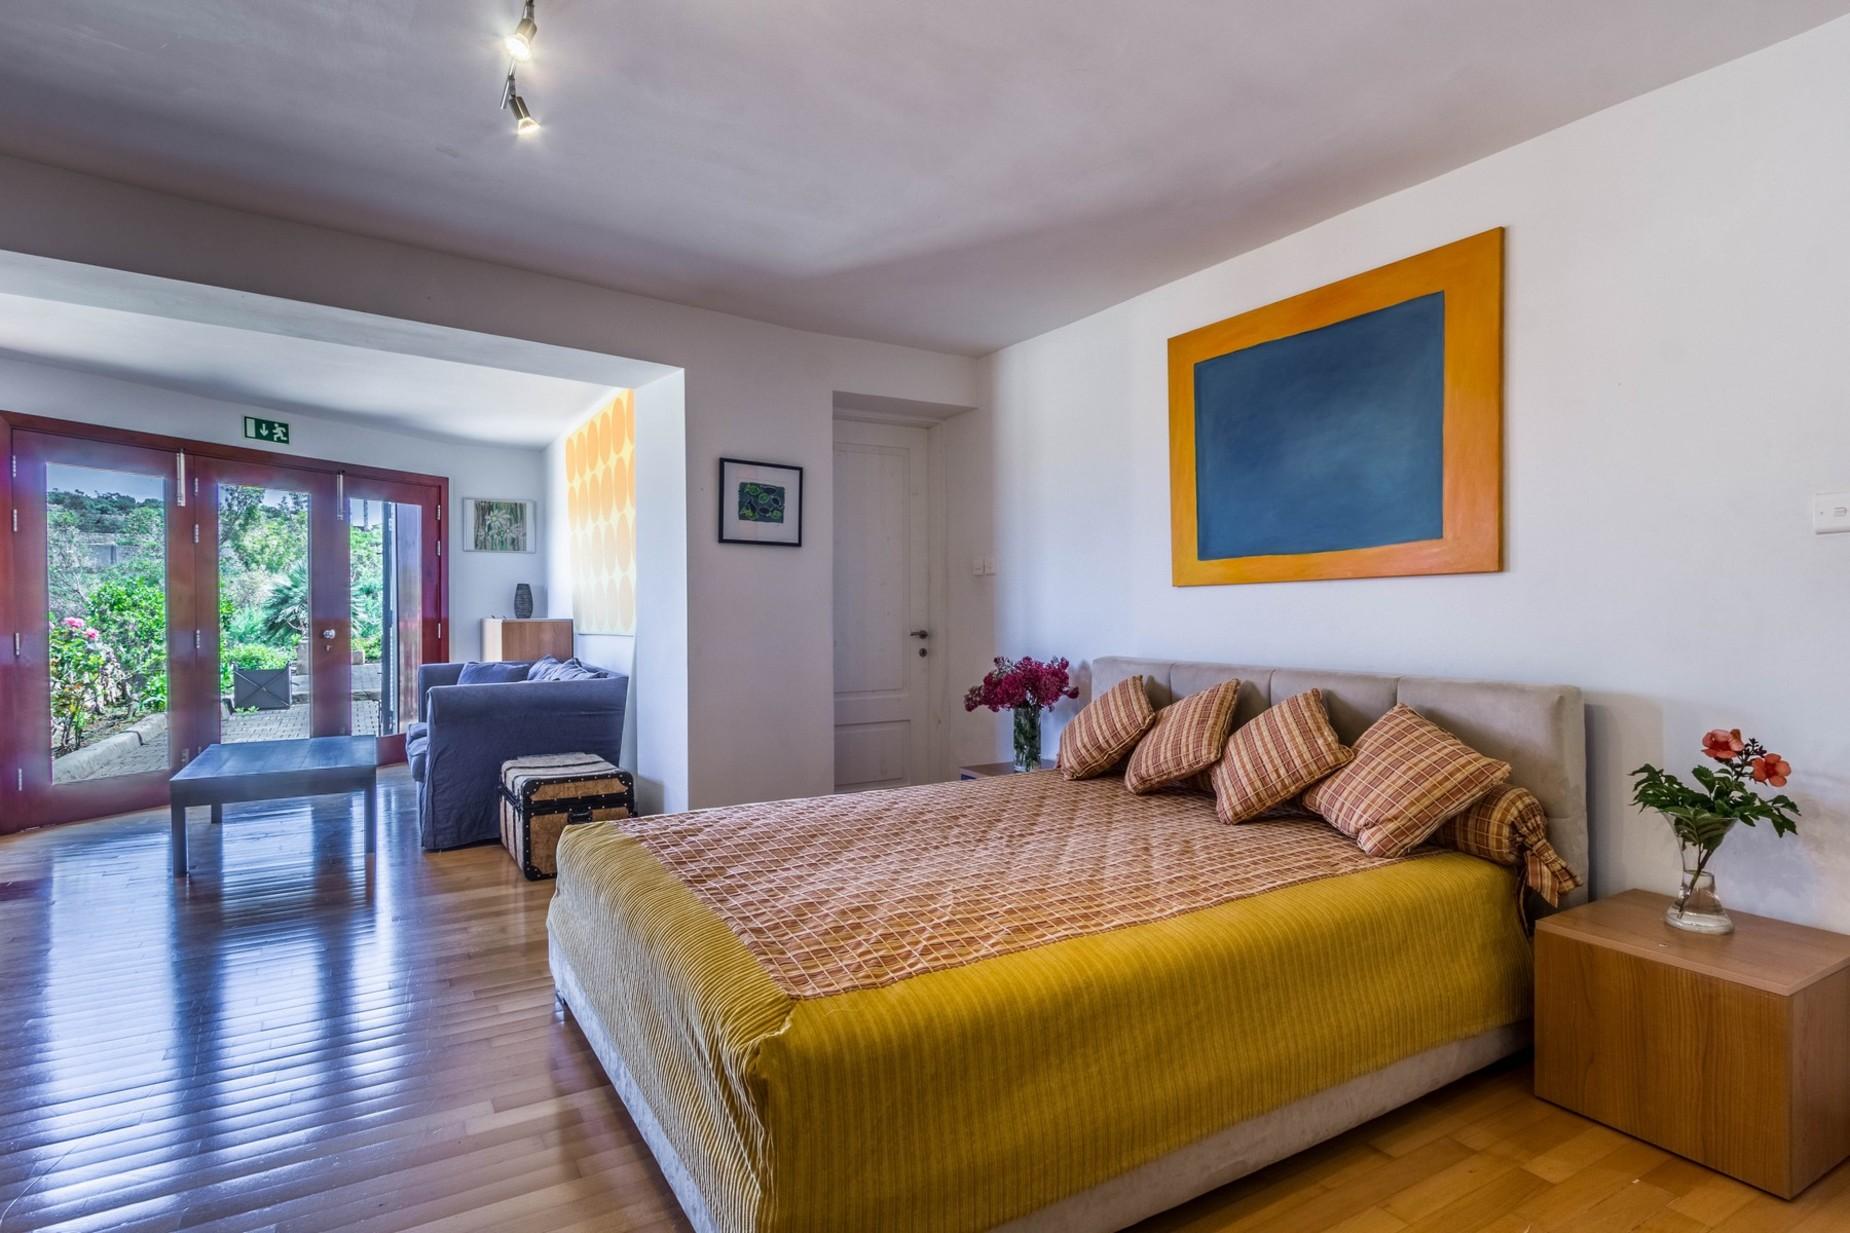 4 bed Villa For Sale in Gharghur, Gharghur - thumb 9